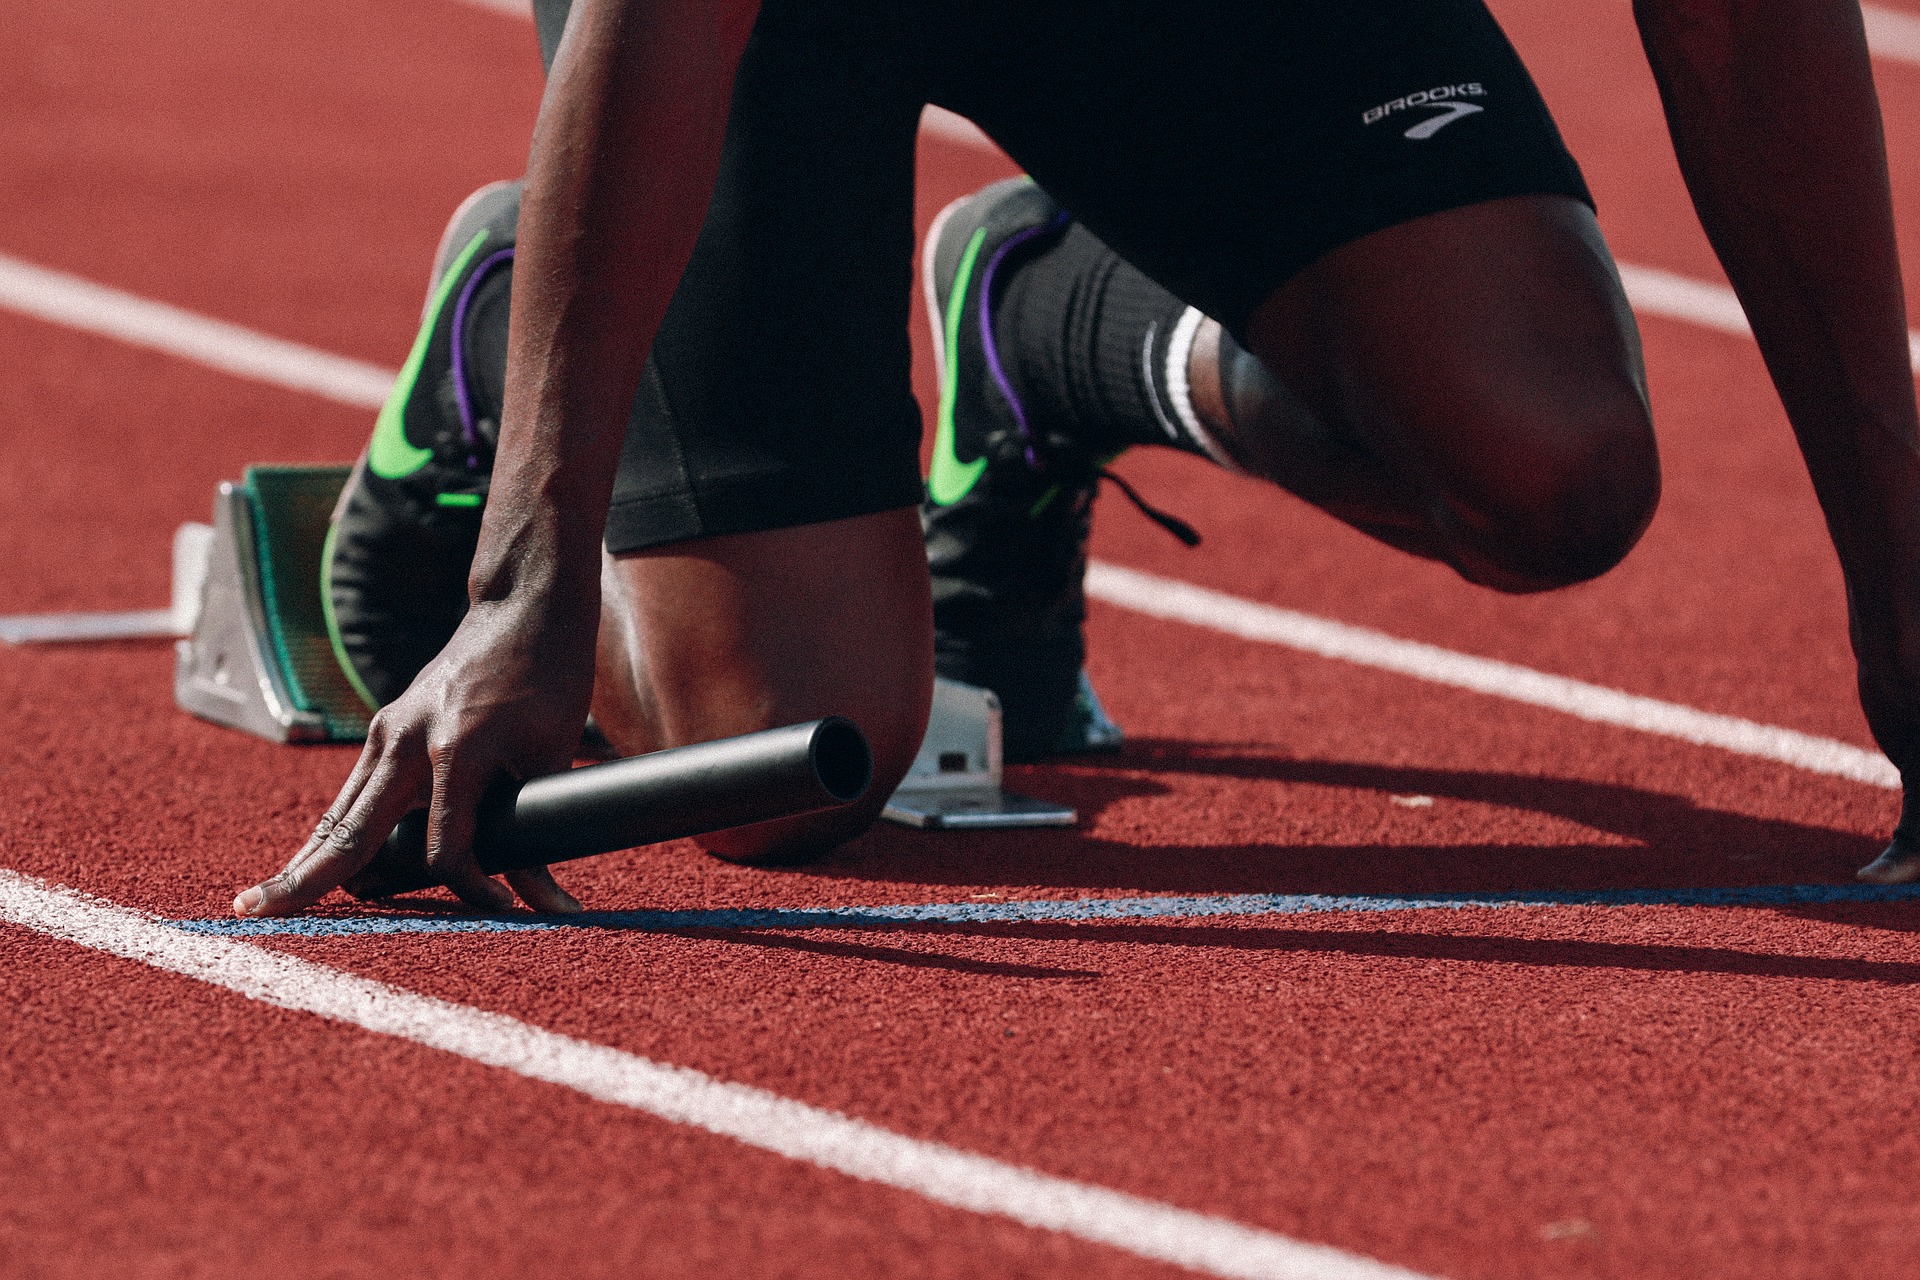 athlete-geting-ready-to-runathlete-geting-ready-to-run